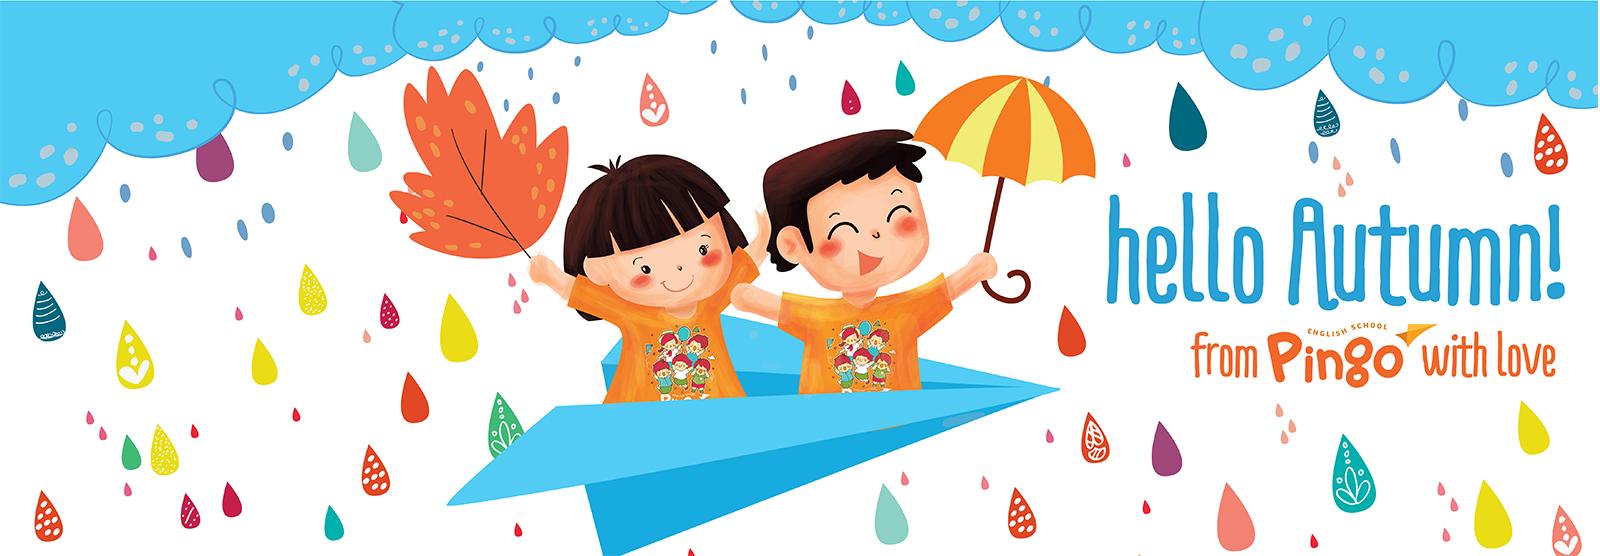 Hello Autumn - PiNGO chào mùa thu